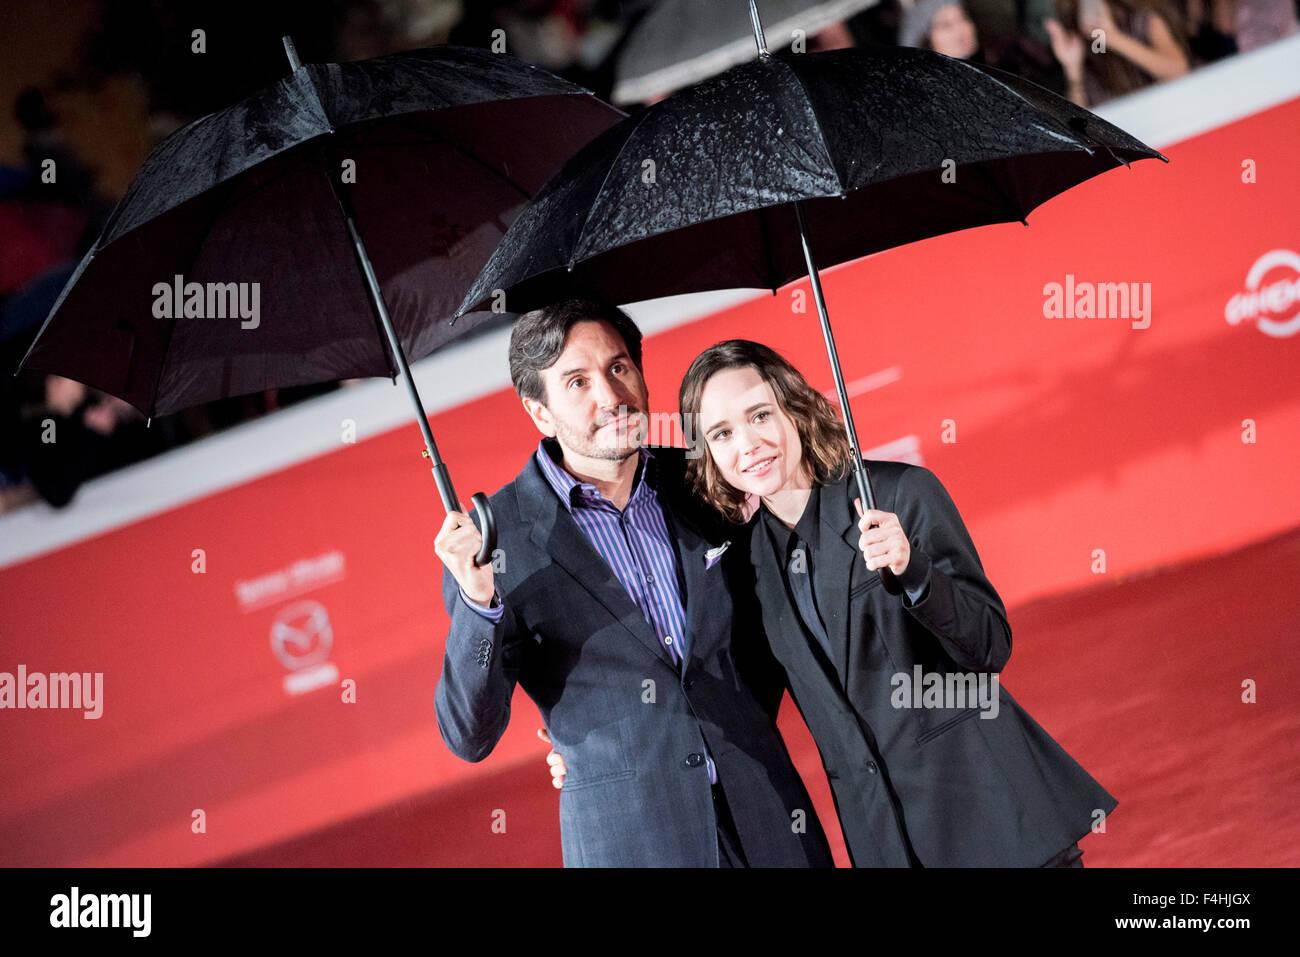 Rome, Italy. 18th Oct, 2015. Rome International Film Festival, red carpet for the film 'Freeheld', starring - Stock Image